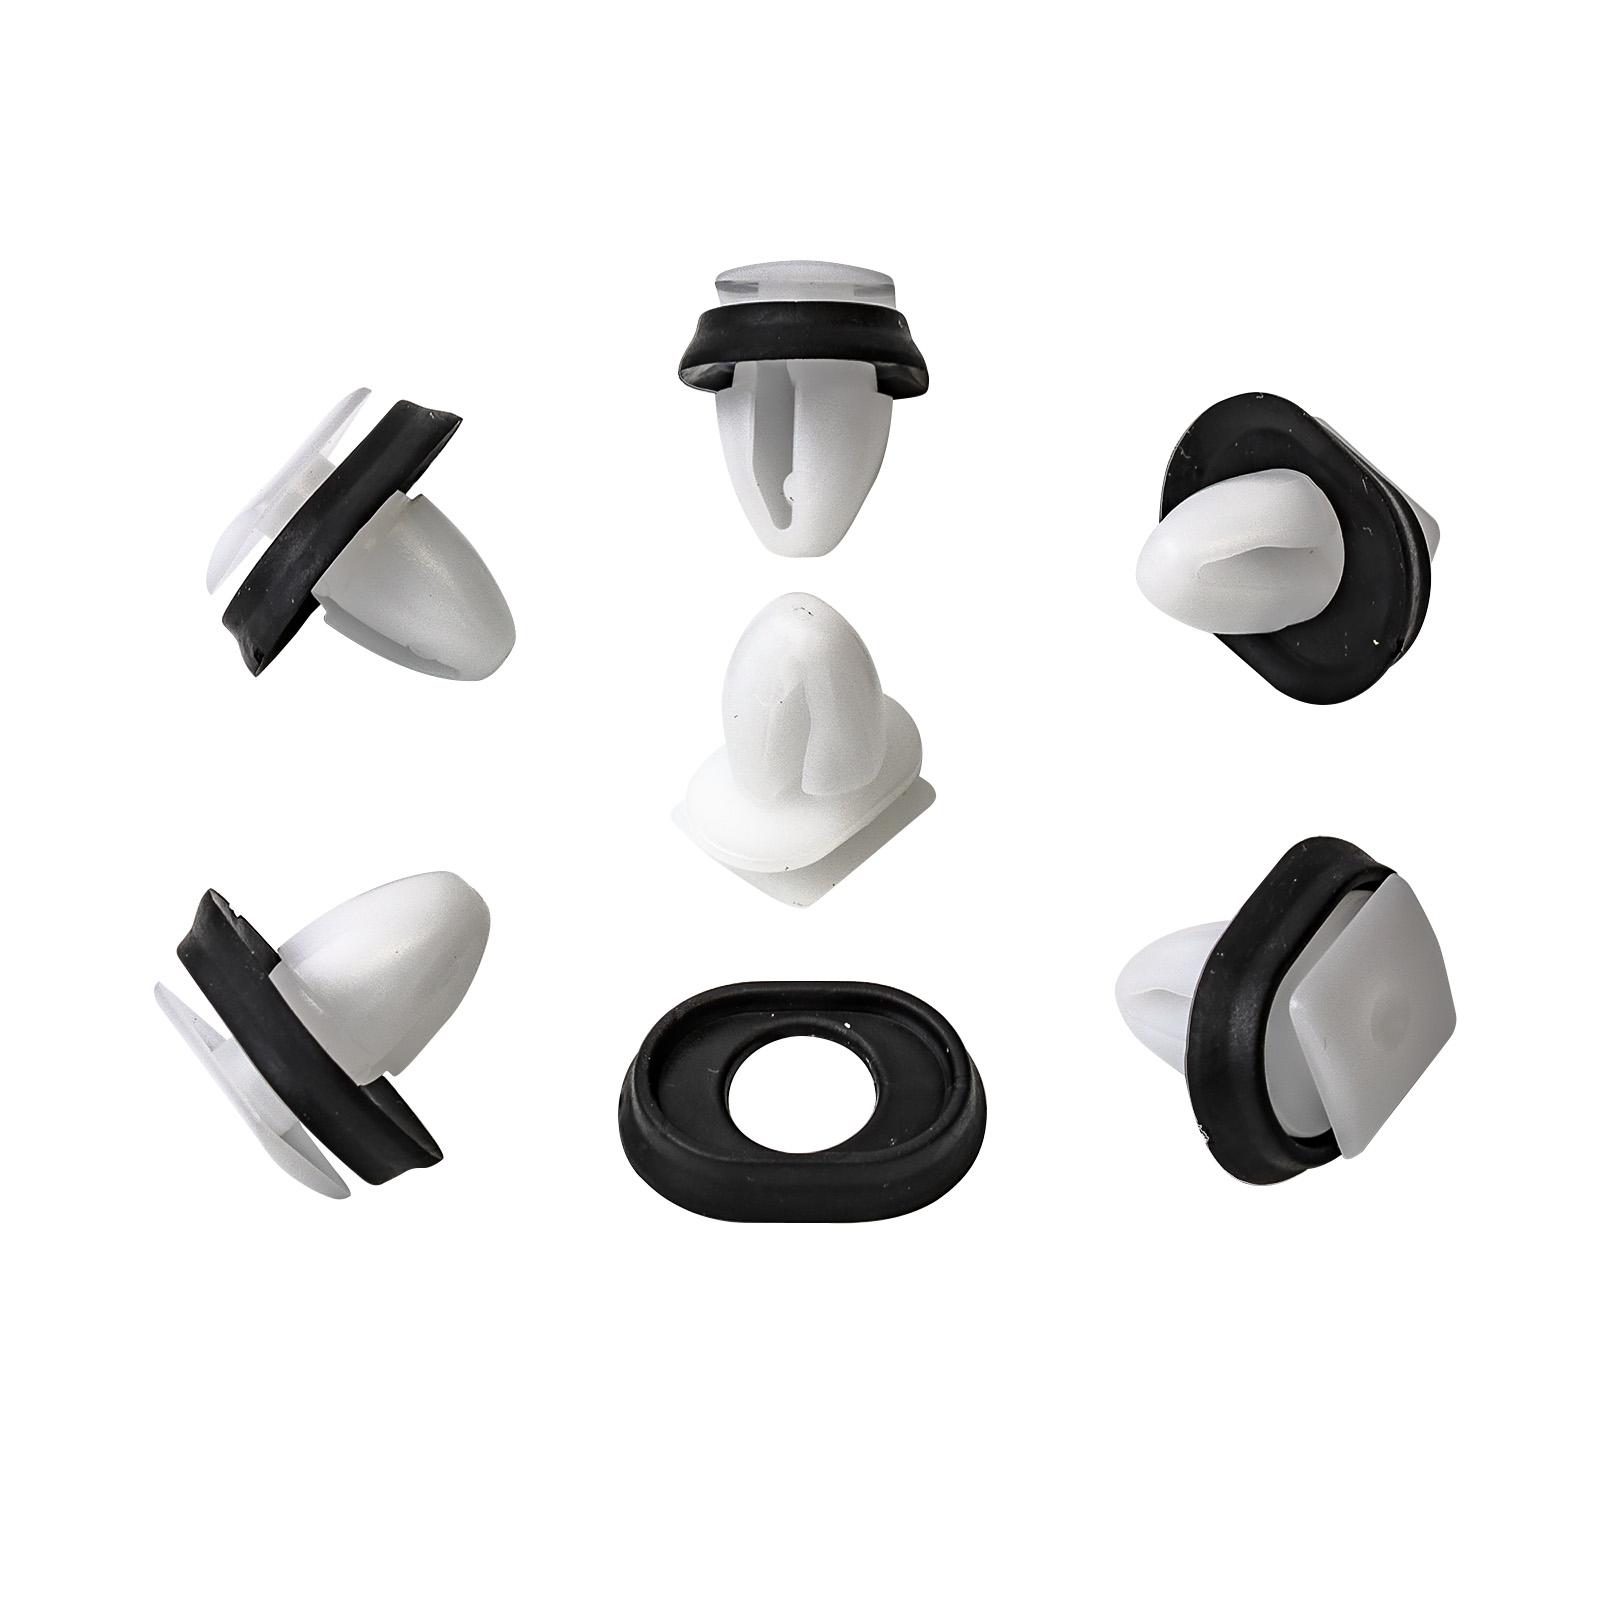 20x RENAULT TÜRVERKLEIDUNG /& Verkleidungs Clips inklusive 7703077111